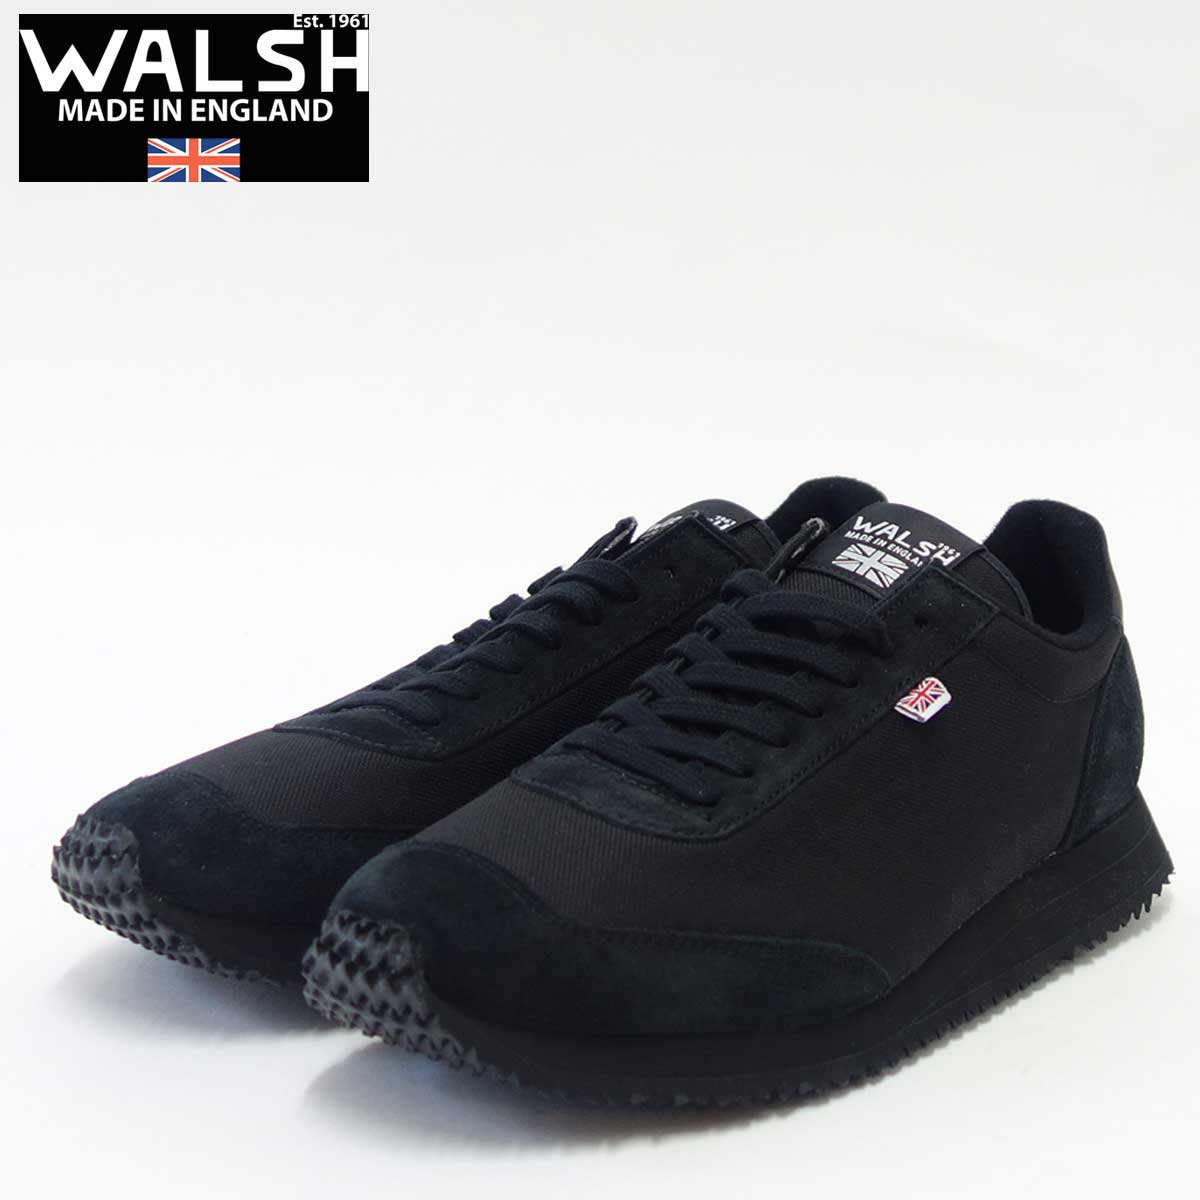 WALSH ウォルシュTOR50063(ユニセックス) Tornado 17カラー:BLACK(英国製) スエード&ナイロンのランニングスニーカー「靴」